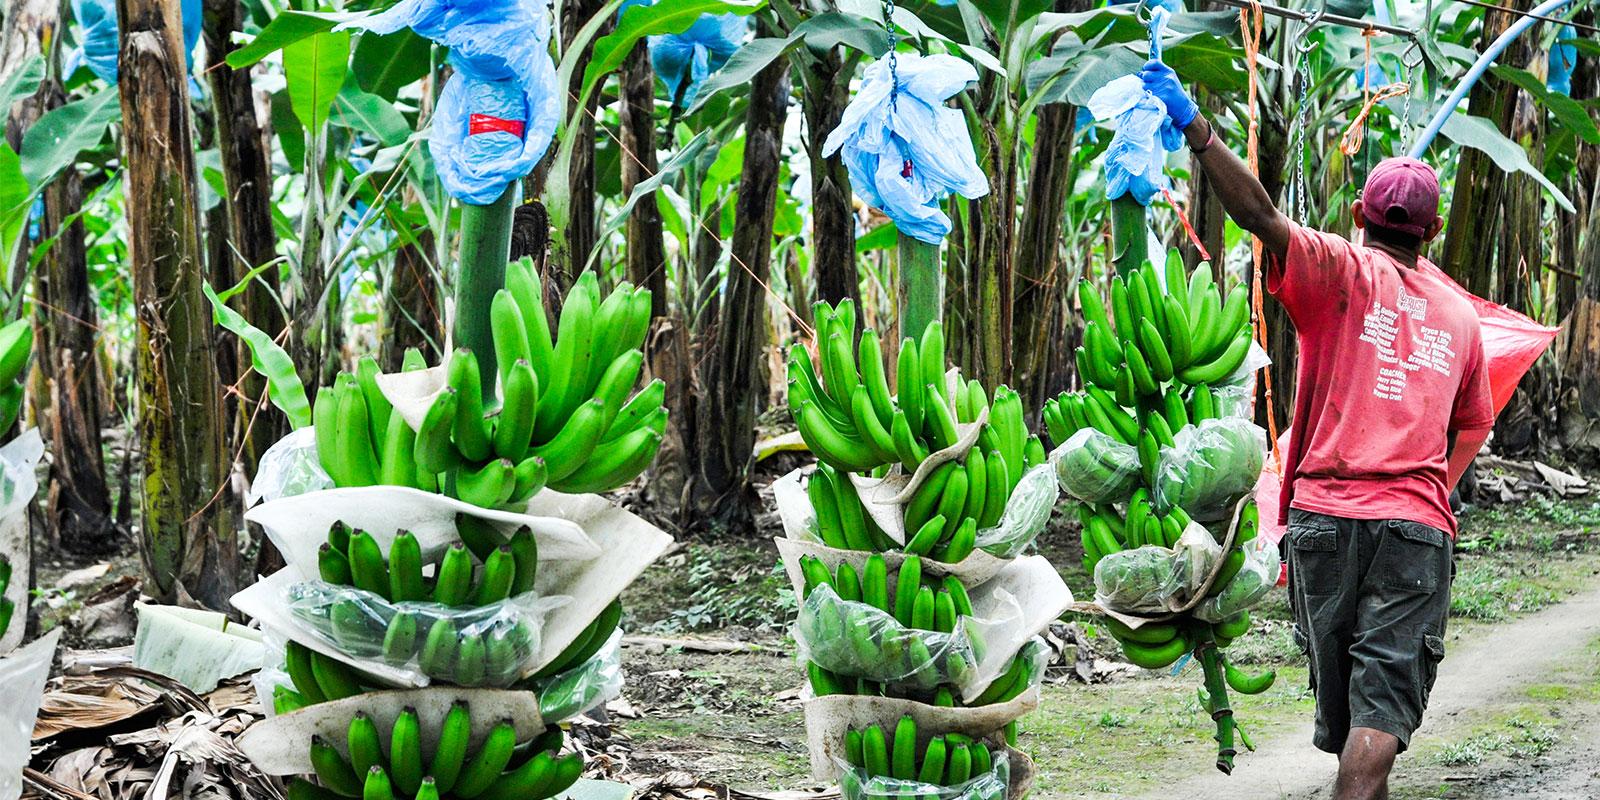 bananaagriculture